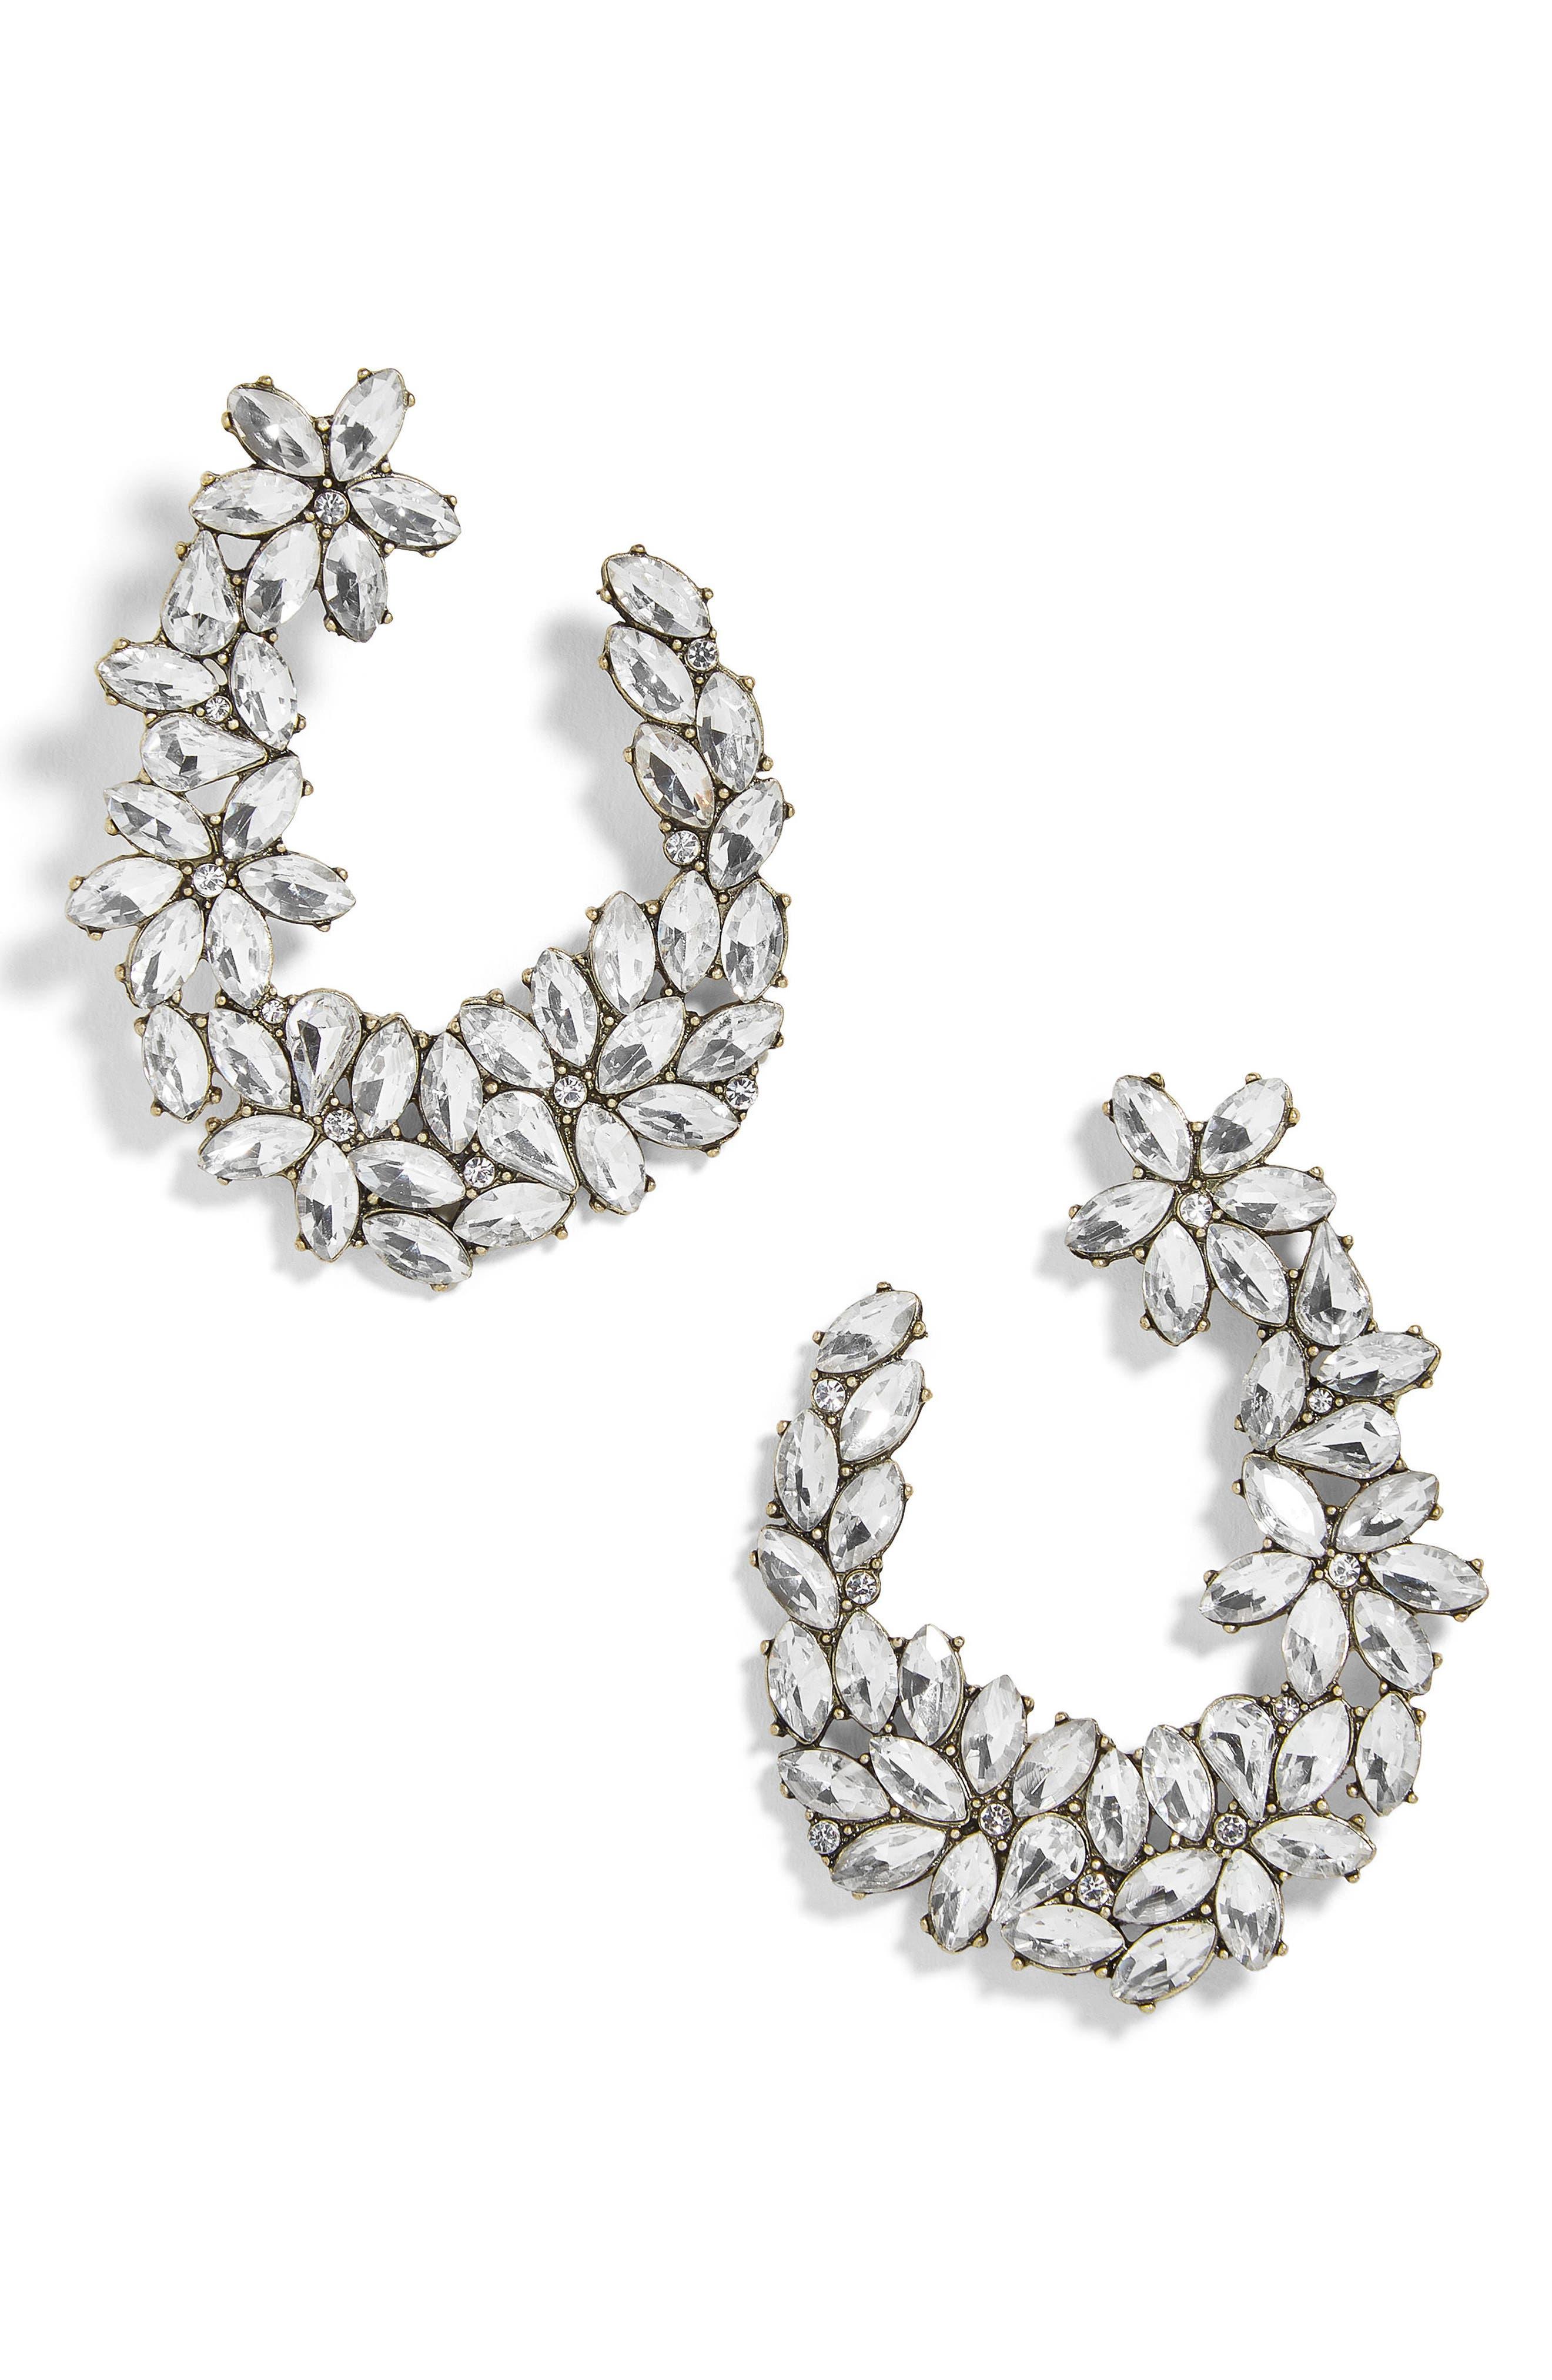 Evolet Hoop Earrings,                             Main thumbnail 1, color,                             719